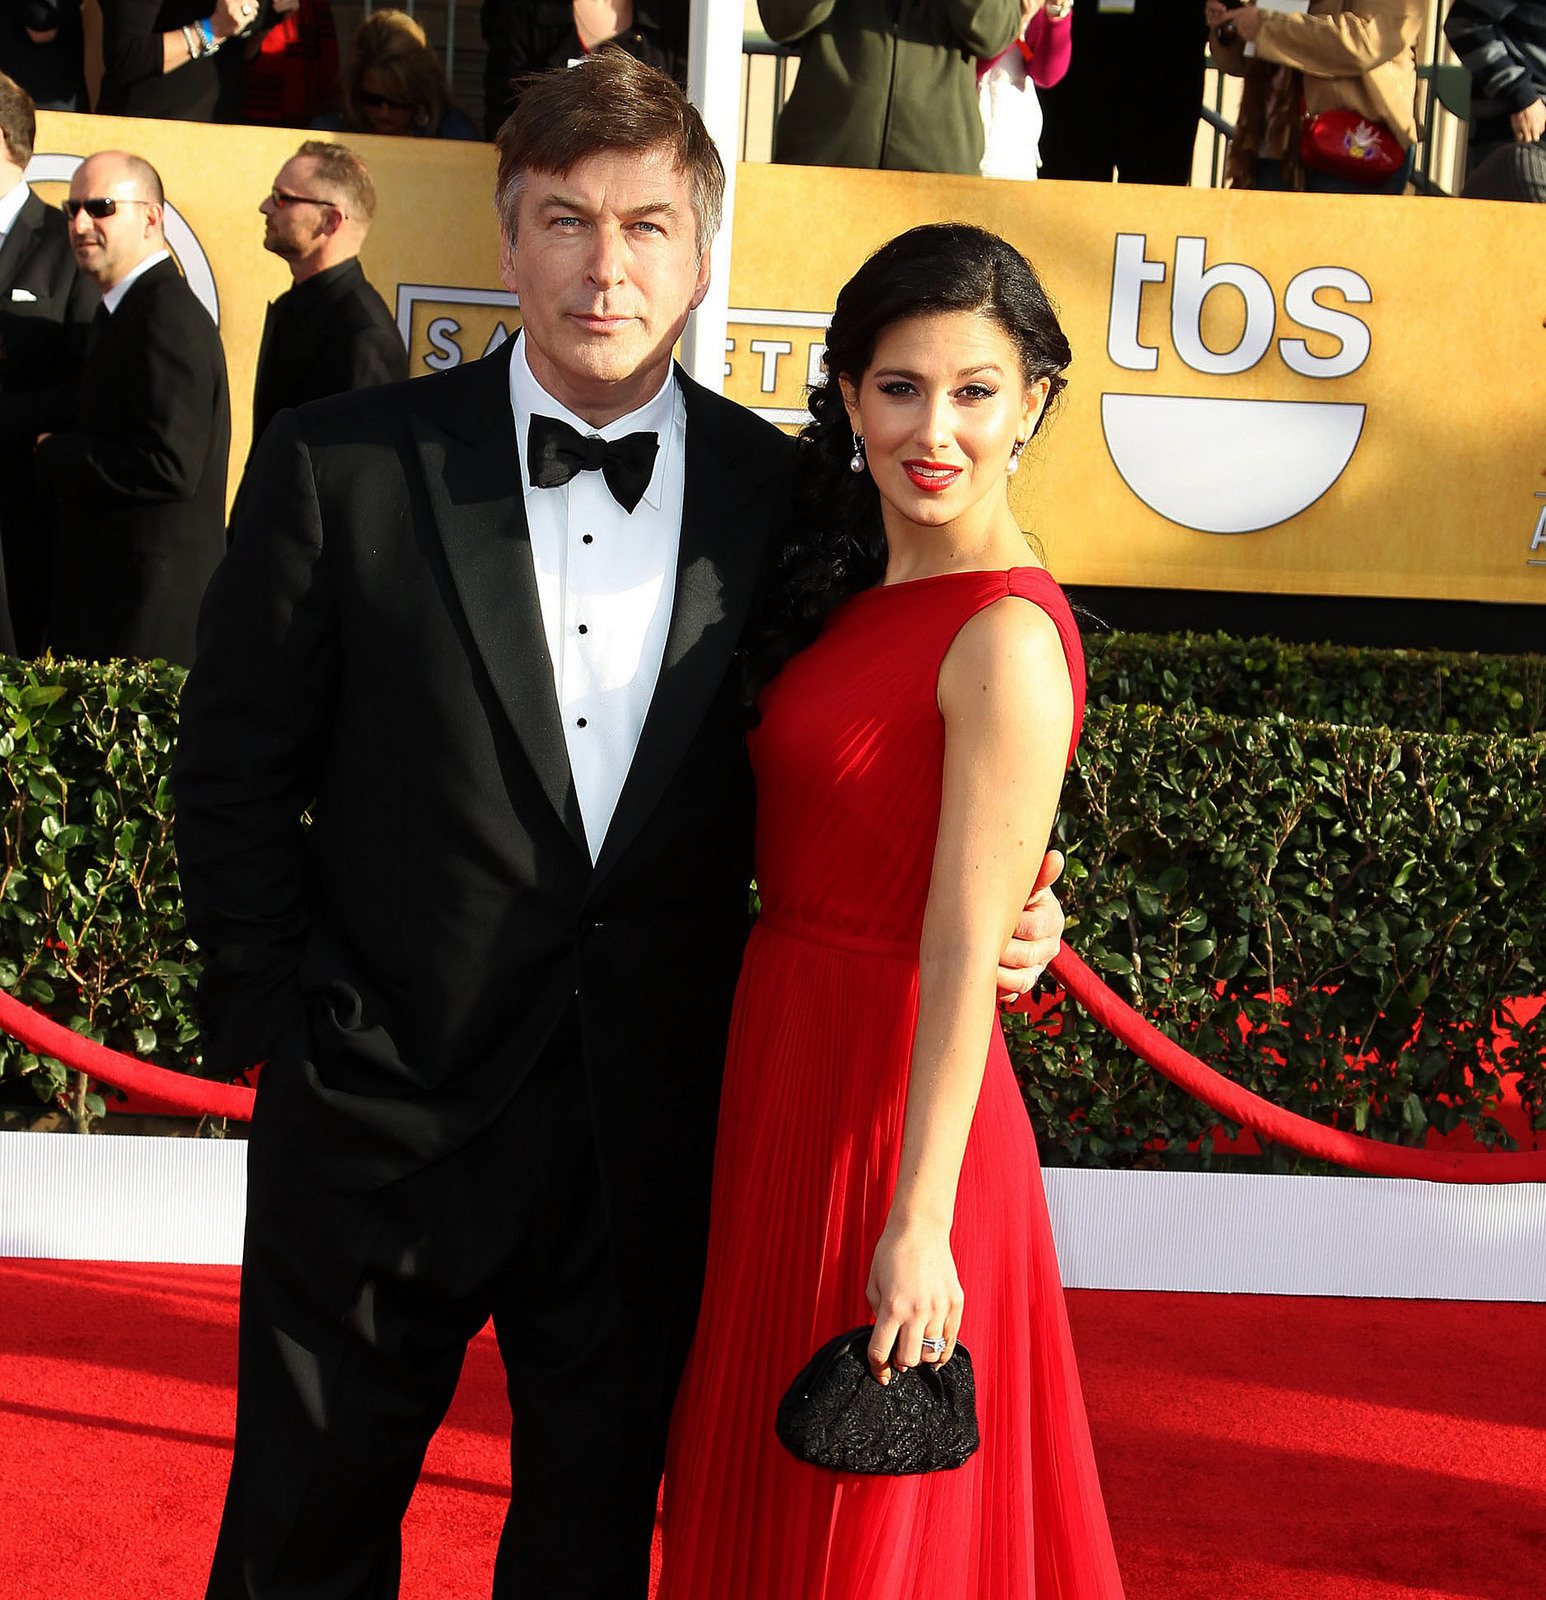 Alec Baldwin Hilaria Thomas baby girl daughter pregnant expecting